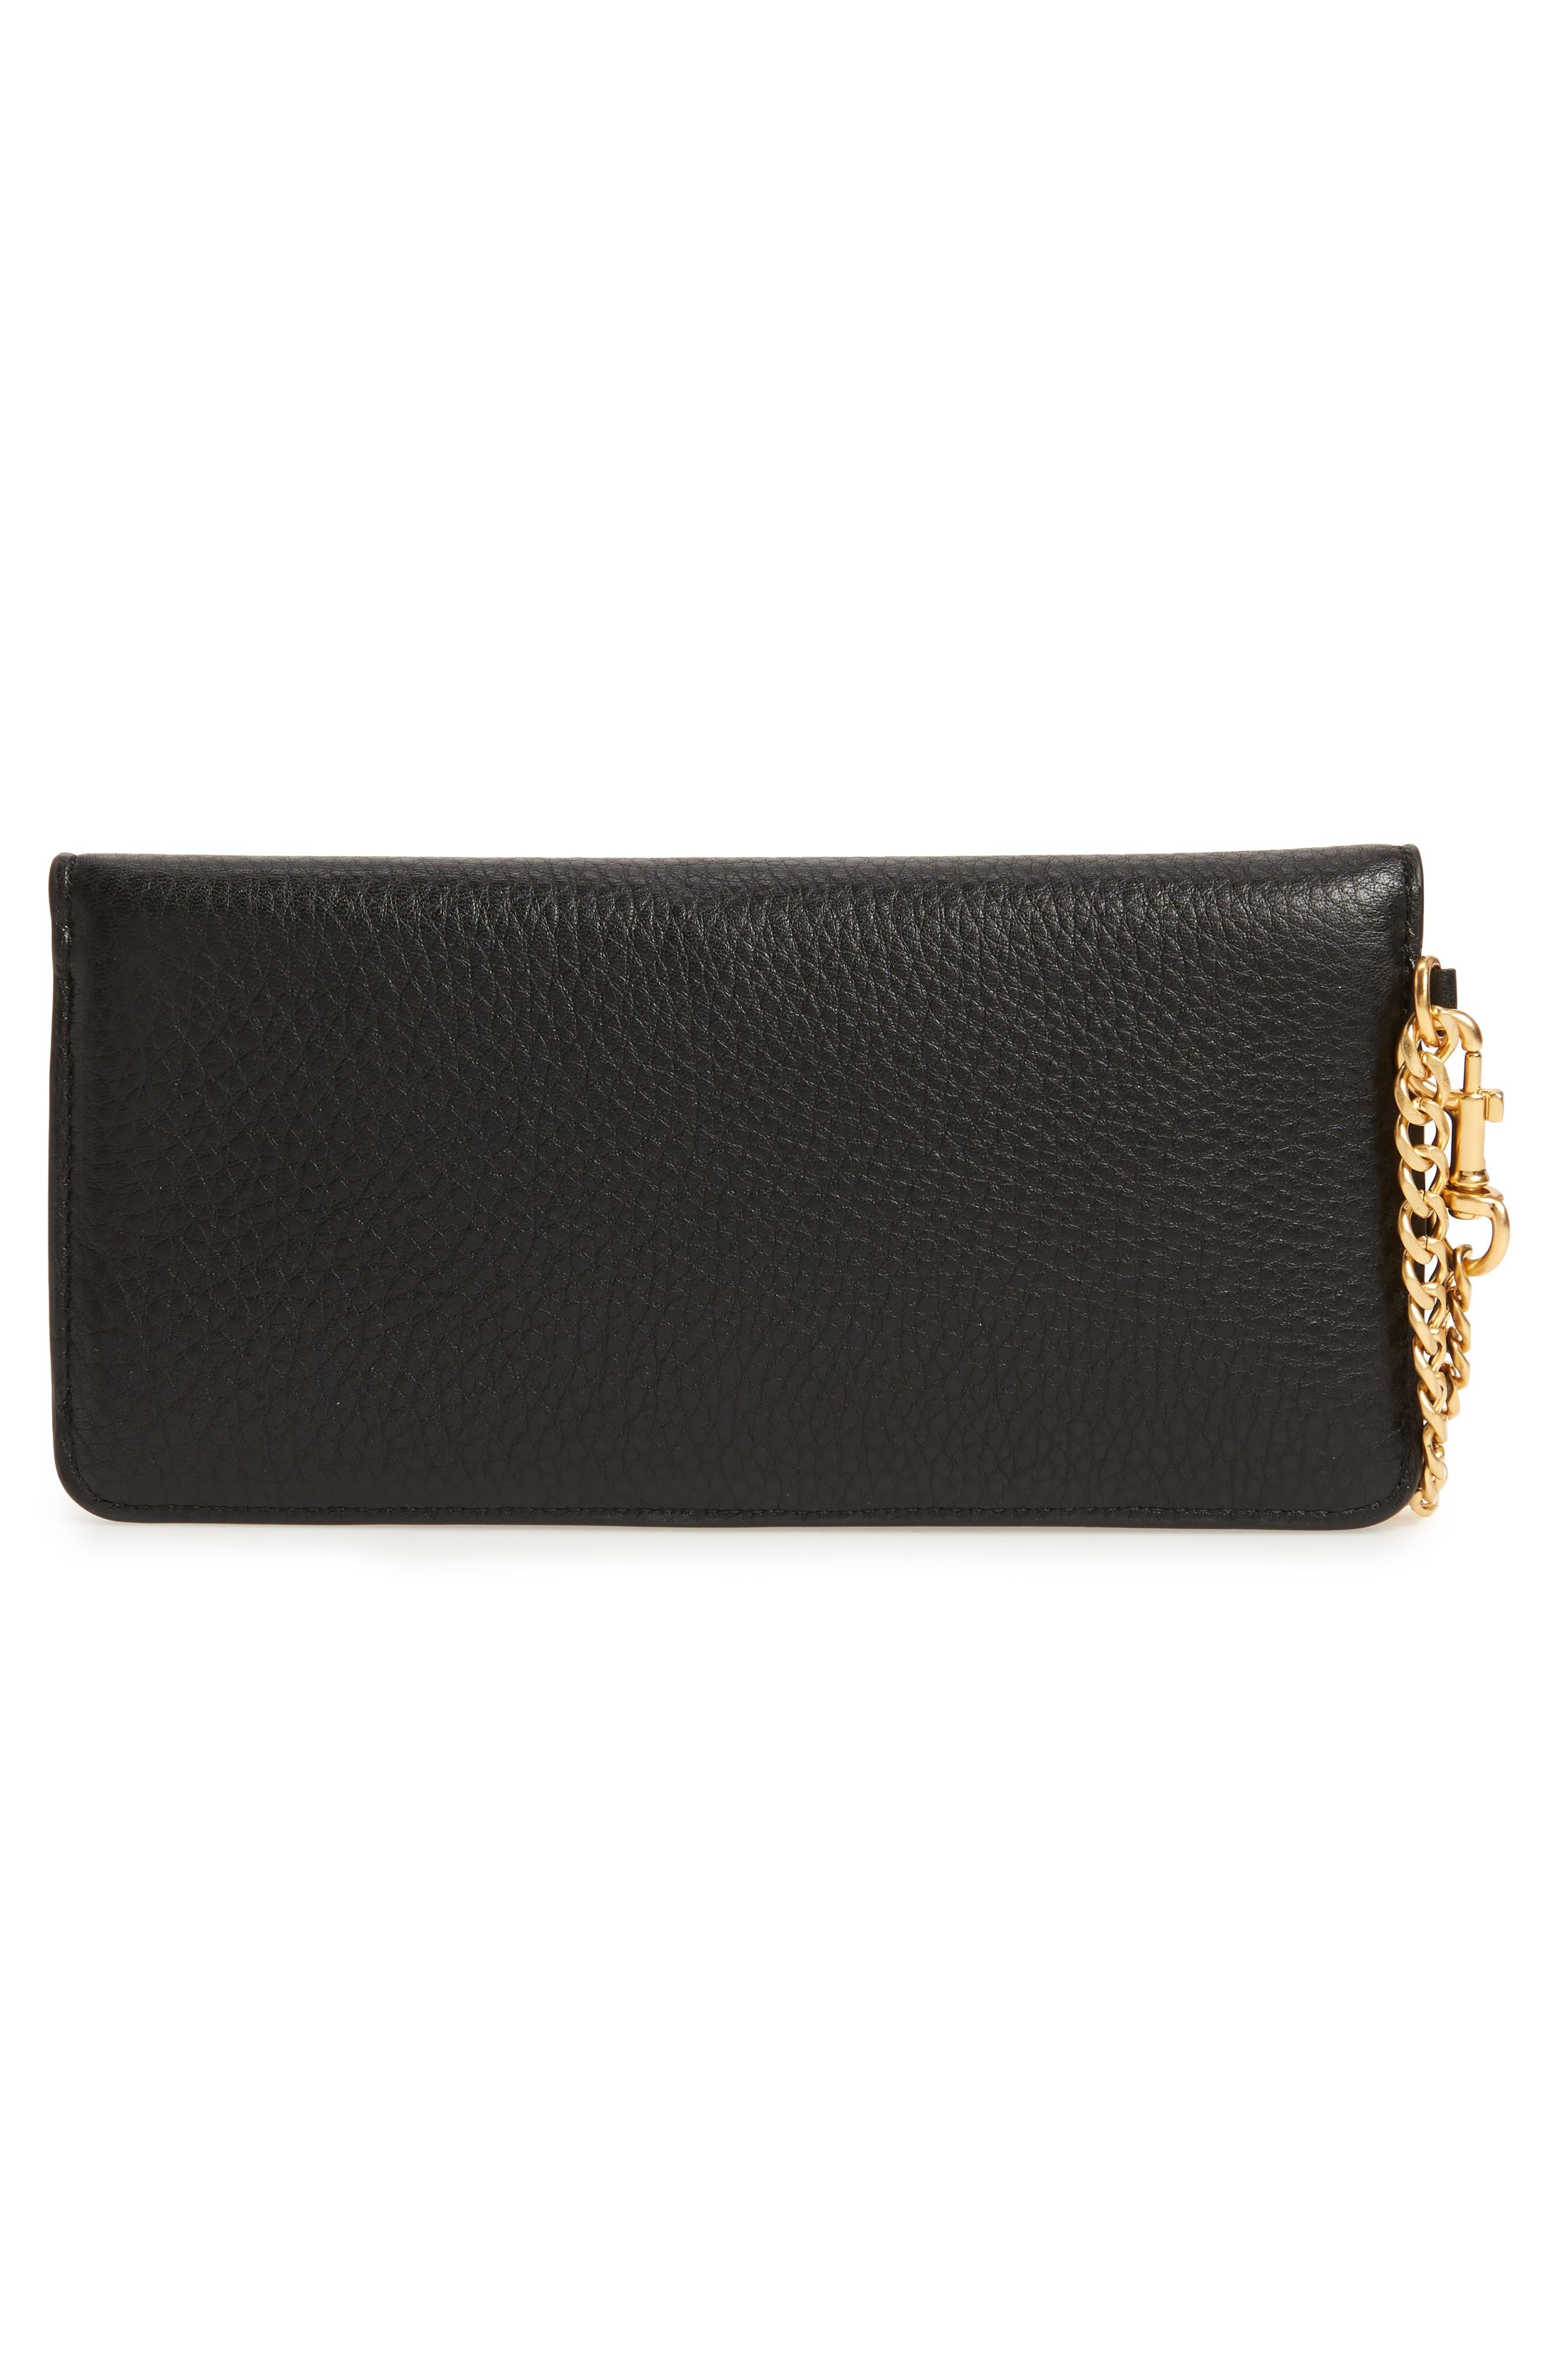 TORY BURCH, Chelsea Leather Wristlet Wallet, Alternate thumbnail 4, color, 001